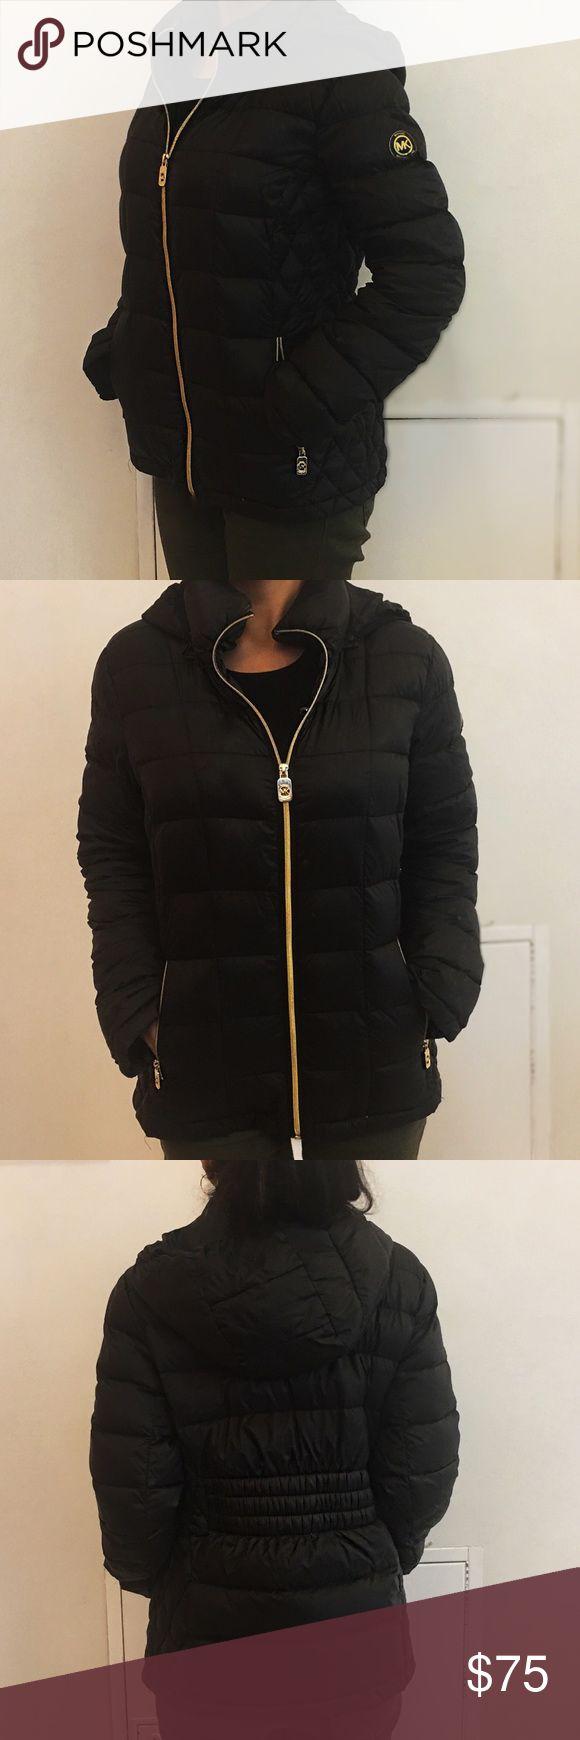 MICHAEL Michael Kors Black Puffer Jacket, M Classic, functional Michael Kors winter jacket in basic black with detachable hood.  Two front zip pockets, MK logo zippers and sleeve logo.  Keep warm this winter with this classic design. MICHAEL Michael Kors Jackets & Coats Puffers